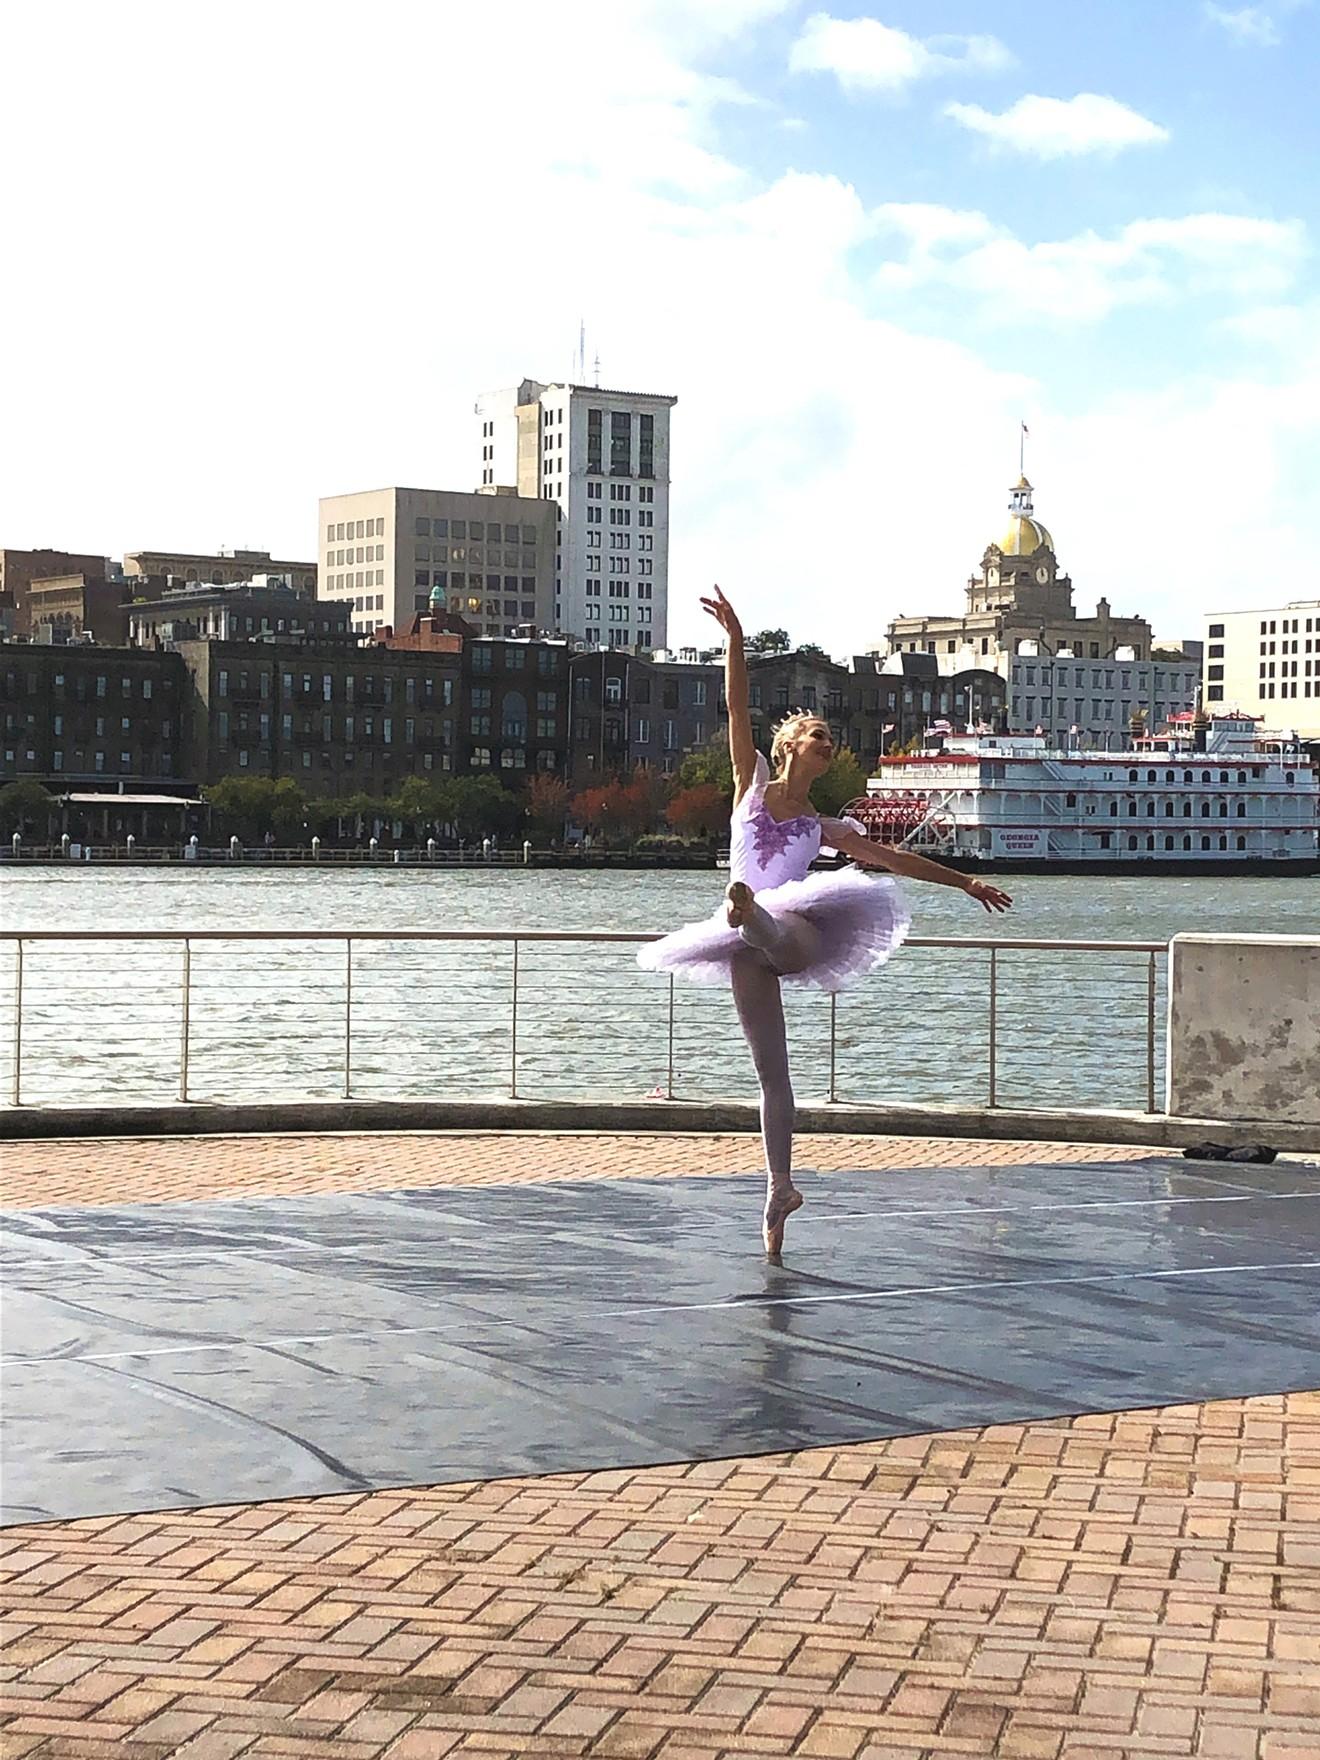 A member of Savannah Ballet dances on River St.